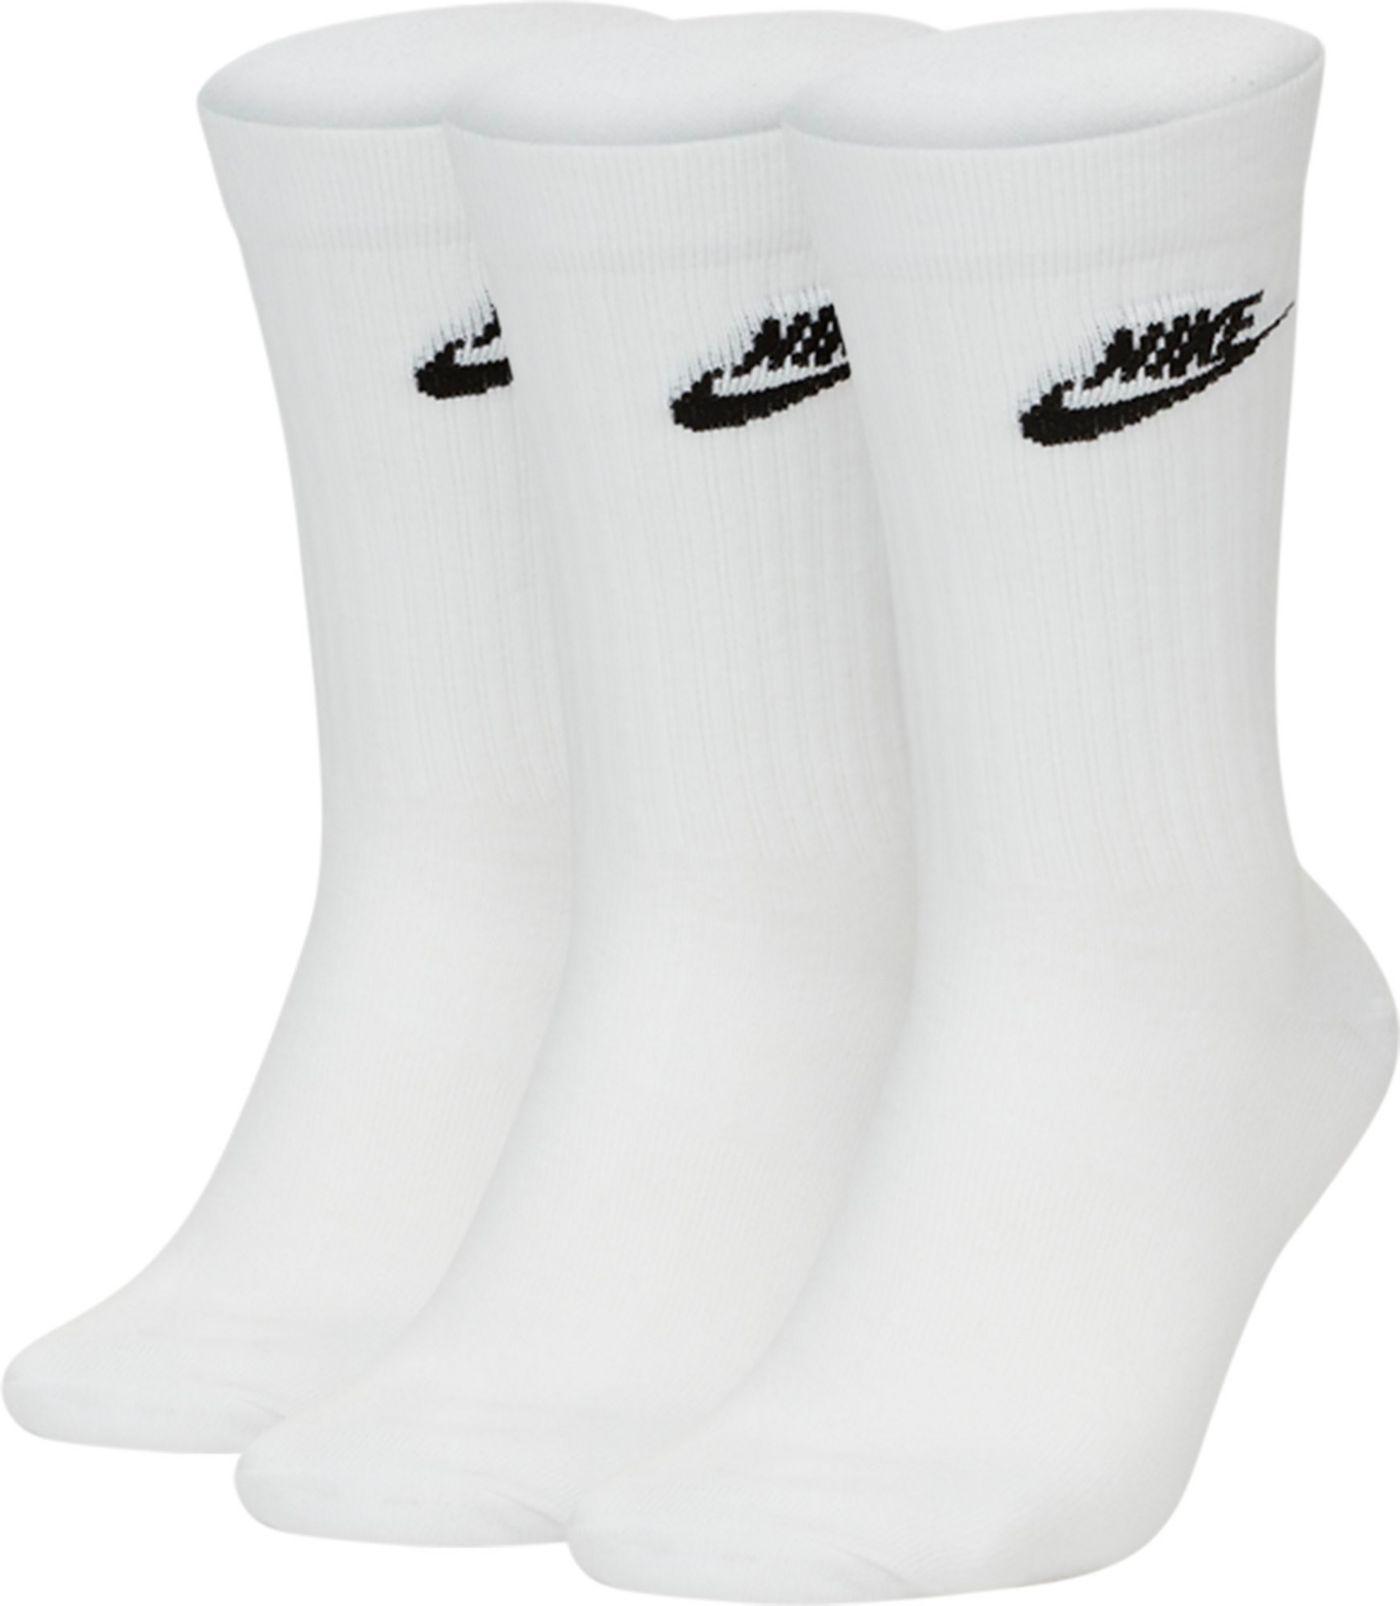 Nike Men's Sportswear Every Essential Crew Socks 3 Pack